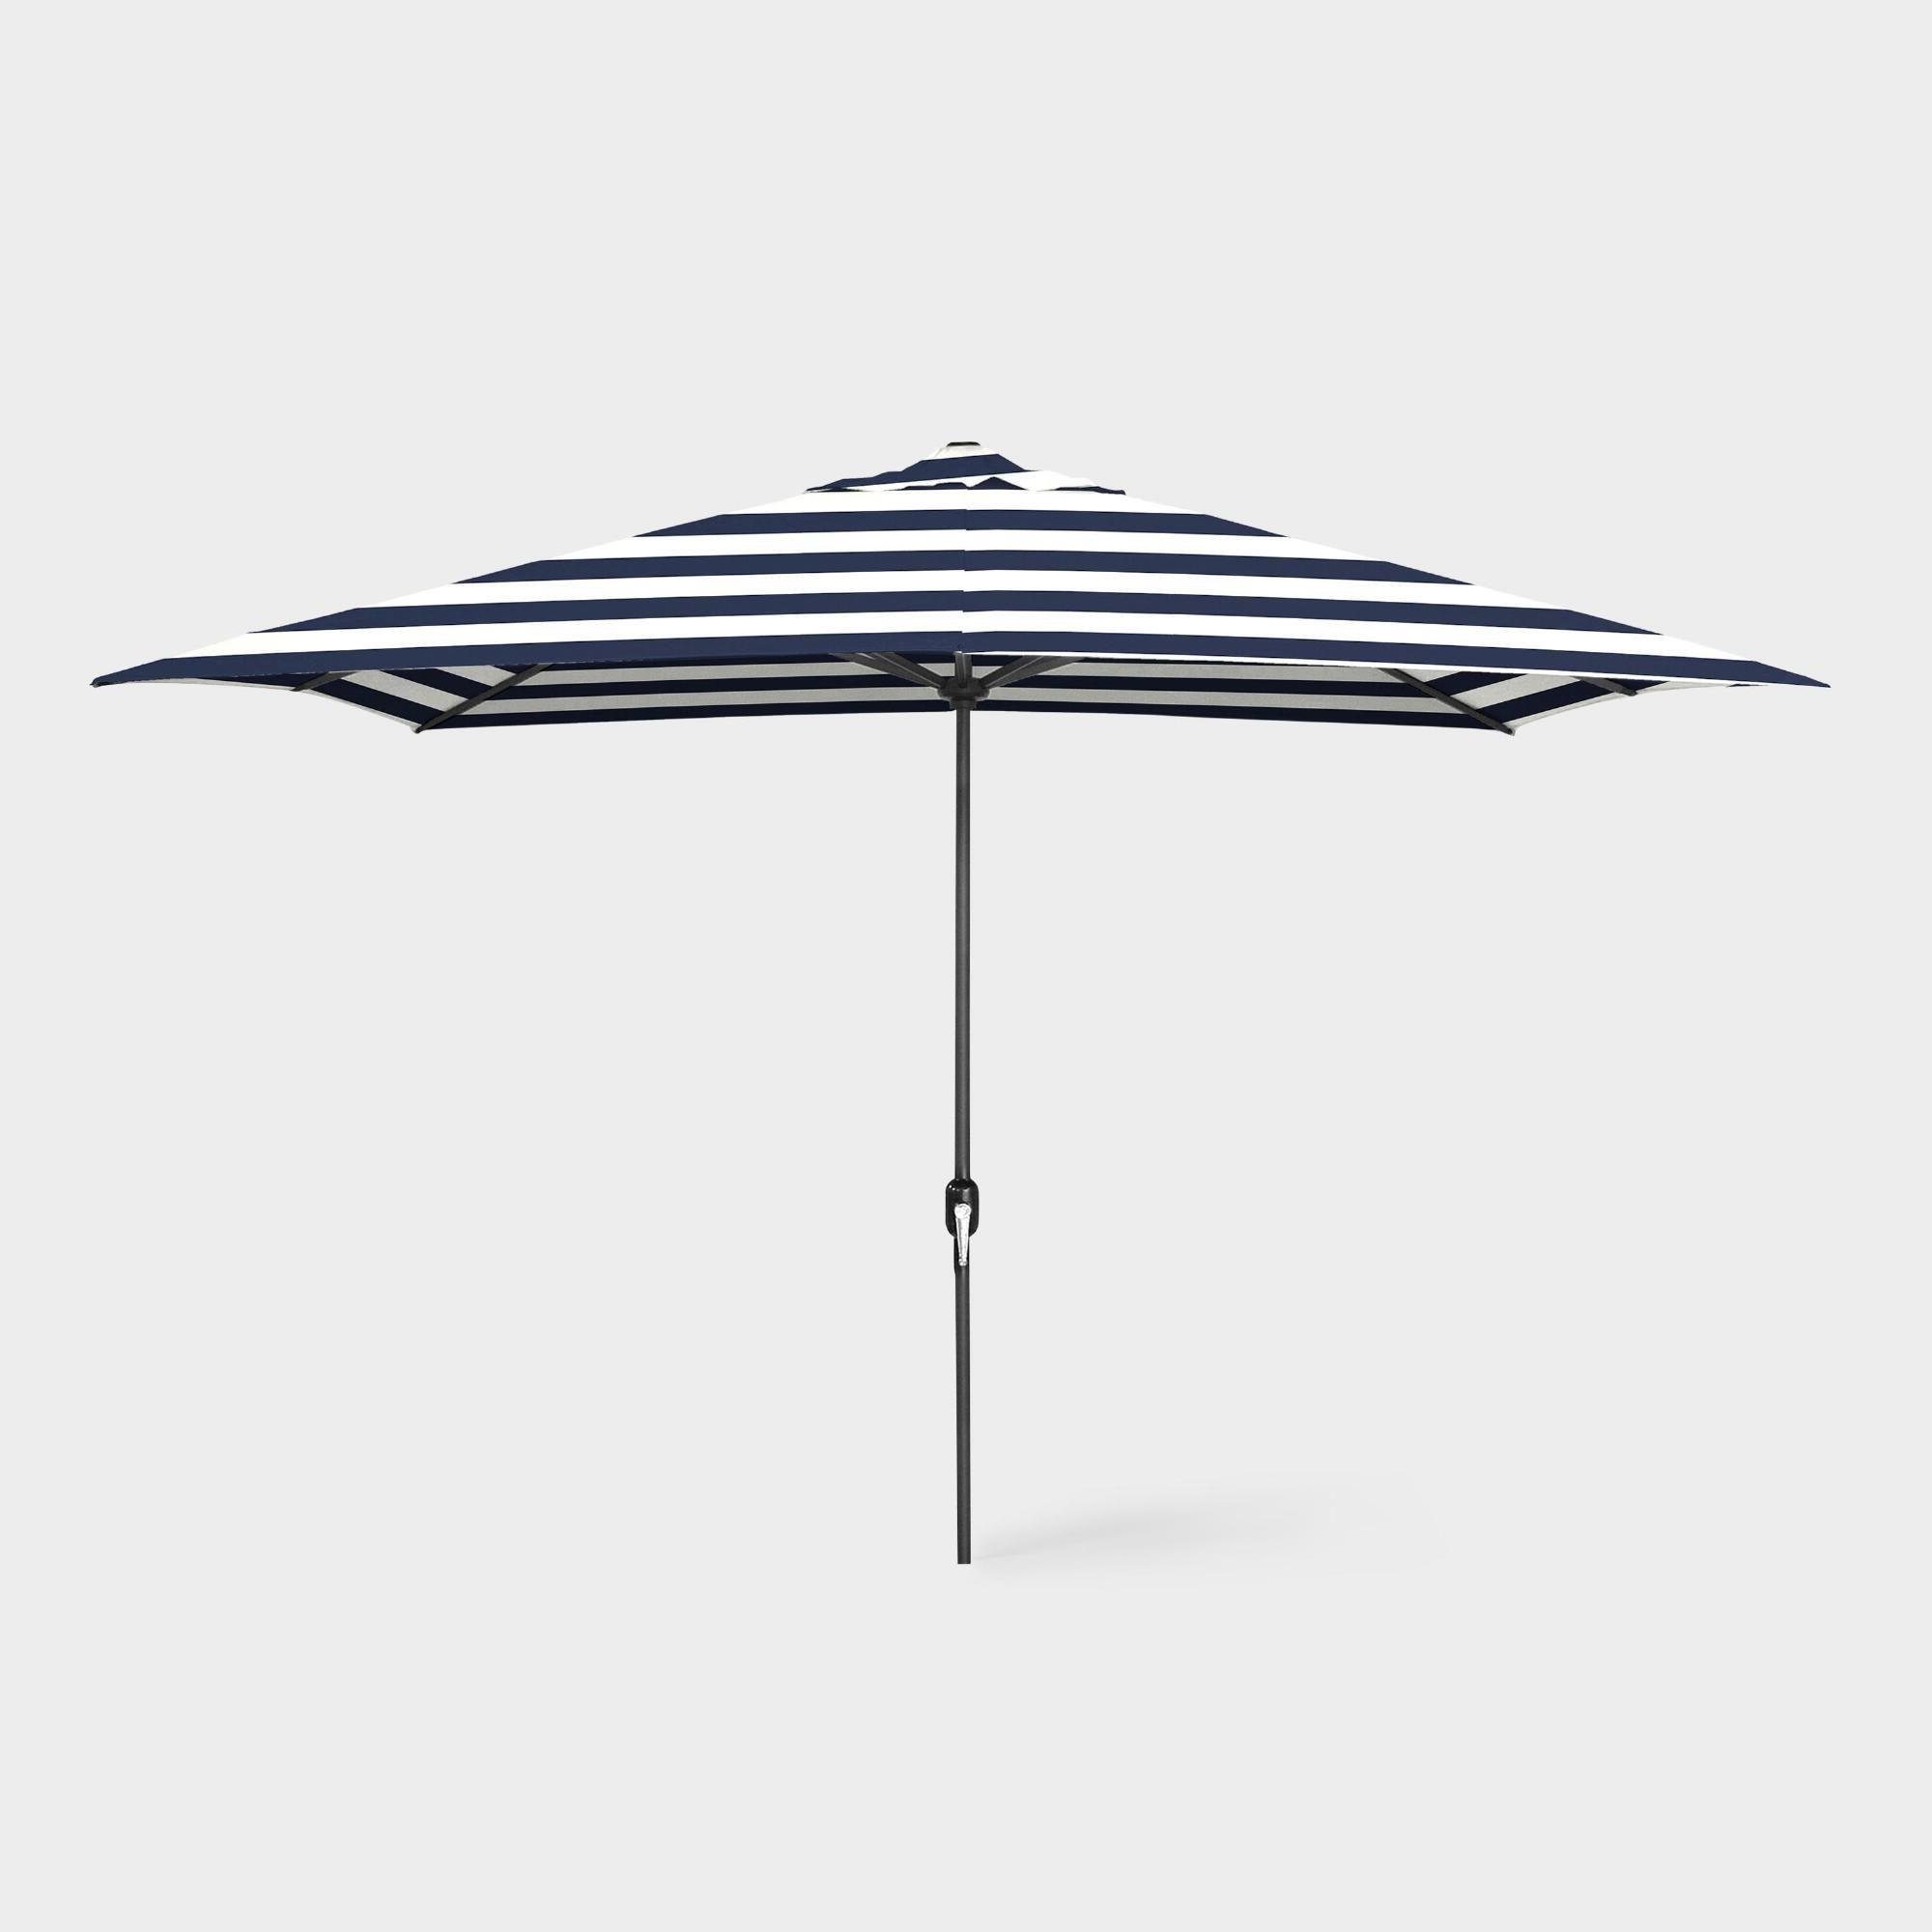 Jerrell Rectangular Market Umbrellas With Latest Best Jerrell 10' X 6.5' Rectangular Market Umbrellafreeport Park (Gallery 10 of 20)